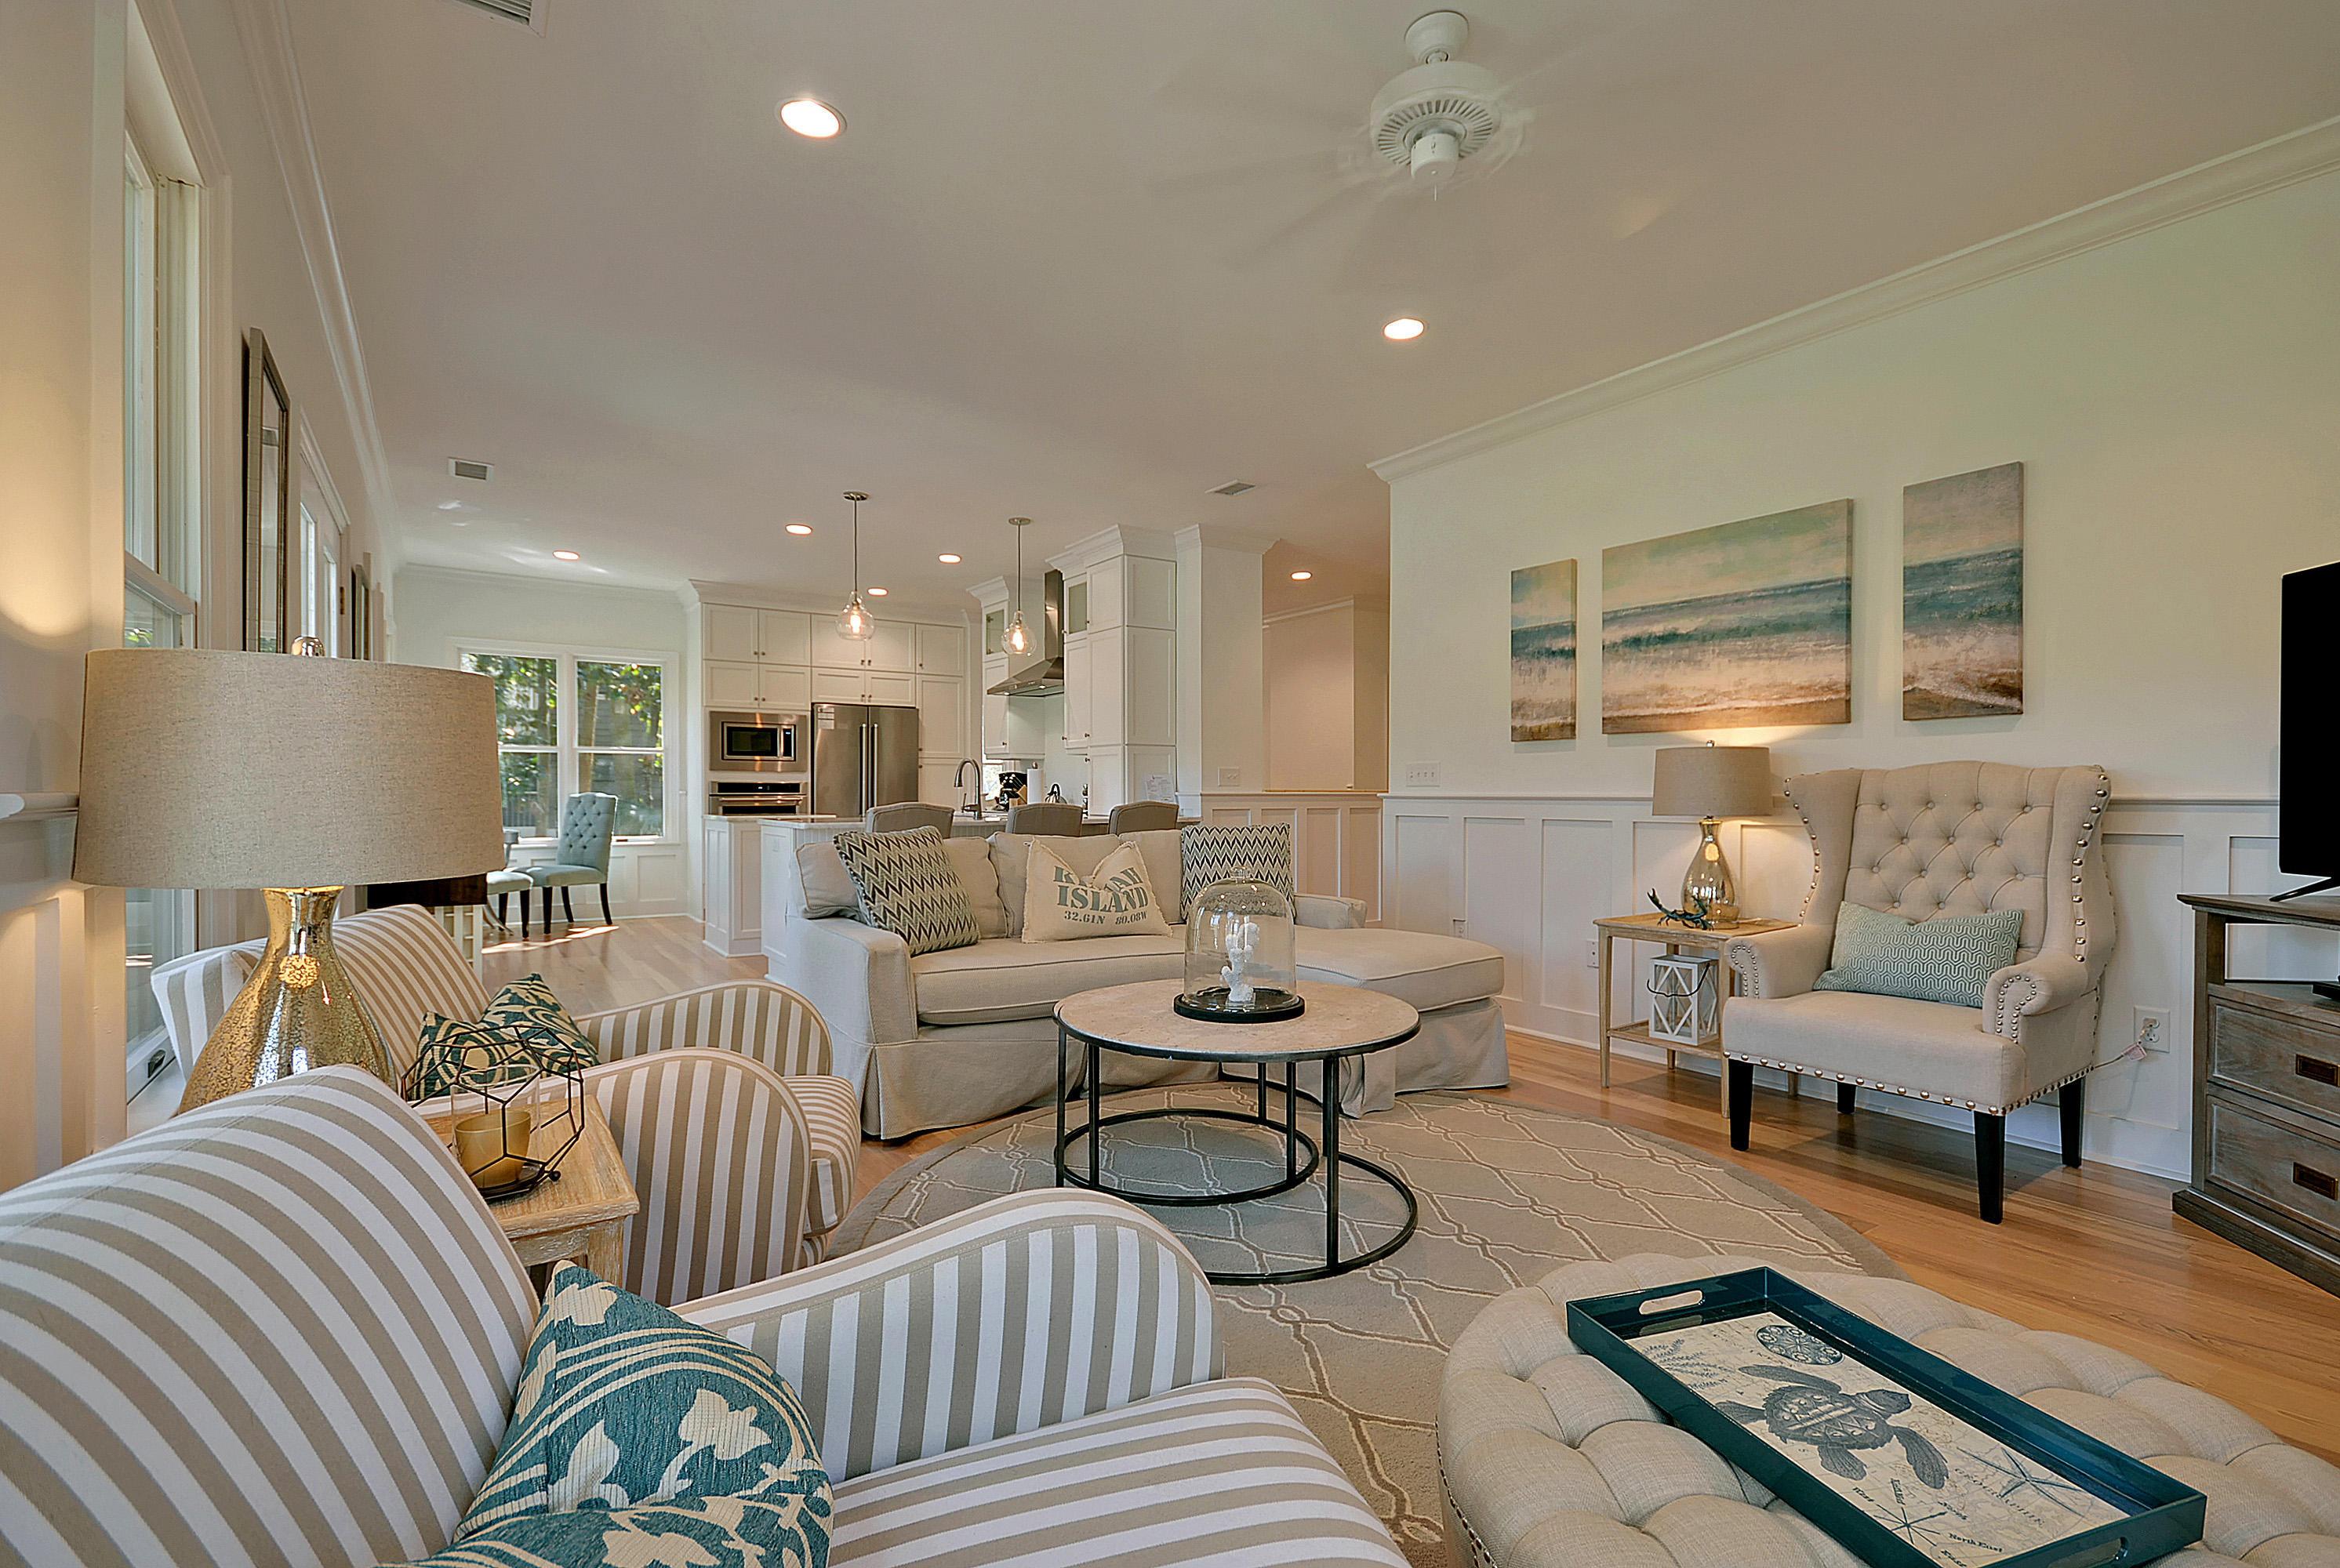 Kiawah Island Homes For Sale - 14 Ocean Green, Kiawah Island, SC - 18